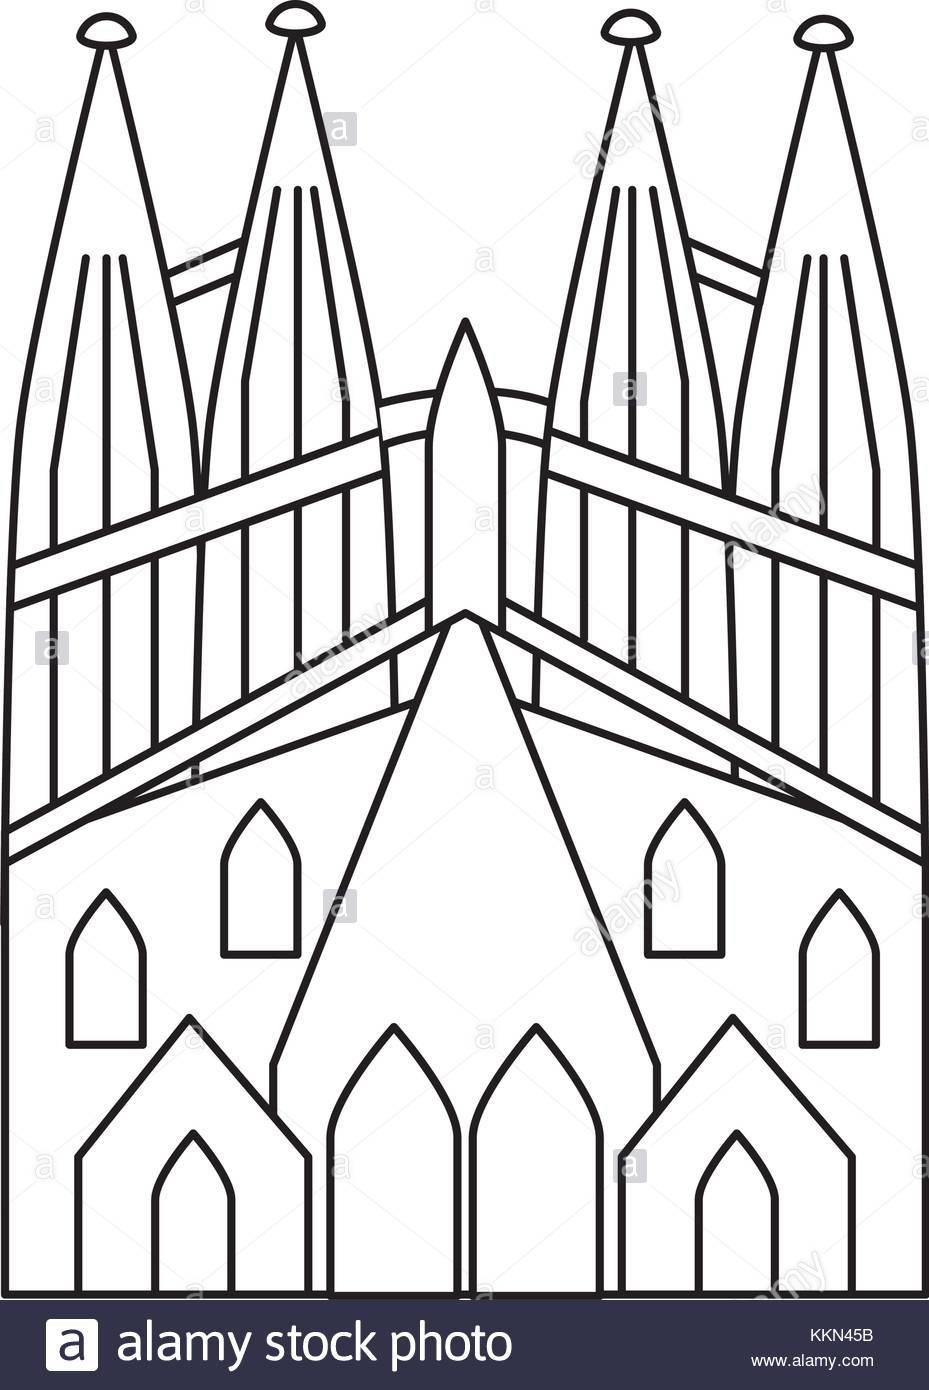 929x1390 Sagrada Familia Gaudi Basilica Temple Church In Barcelona Spain